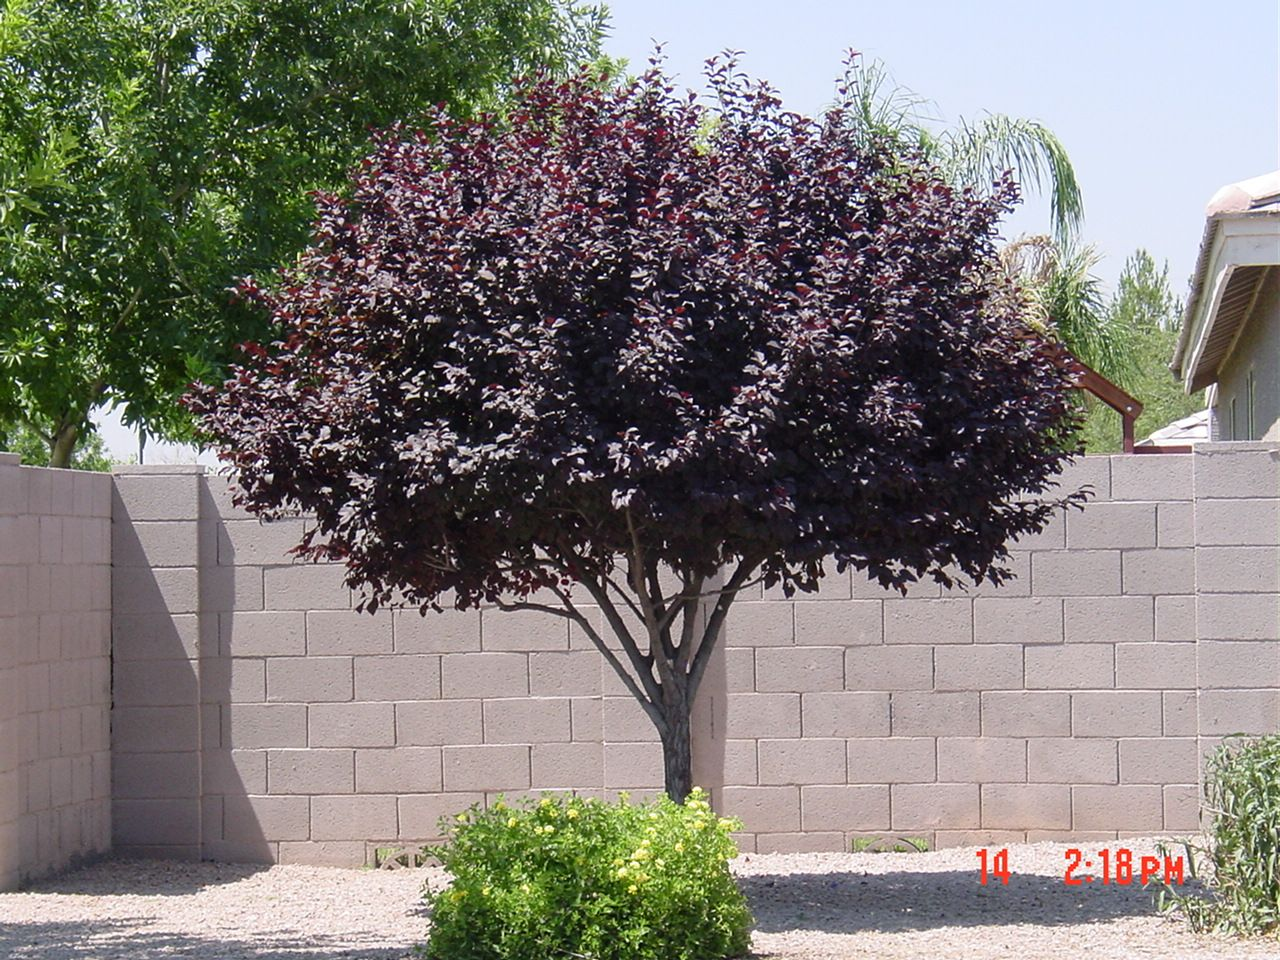 Google Image Result For Http 4 Bp Blogspot Com Jtx Hol4zuk Tz4oznk9uui Aaaaaaaabma Bmxkqcsgjre S1600 Purp Purple Plum Tree Purple Leaf Plum Tree Shade Trees